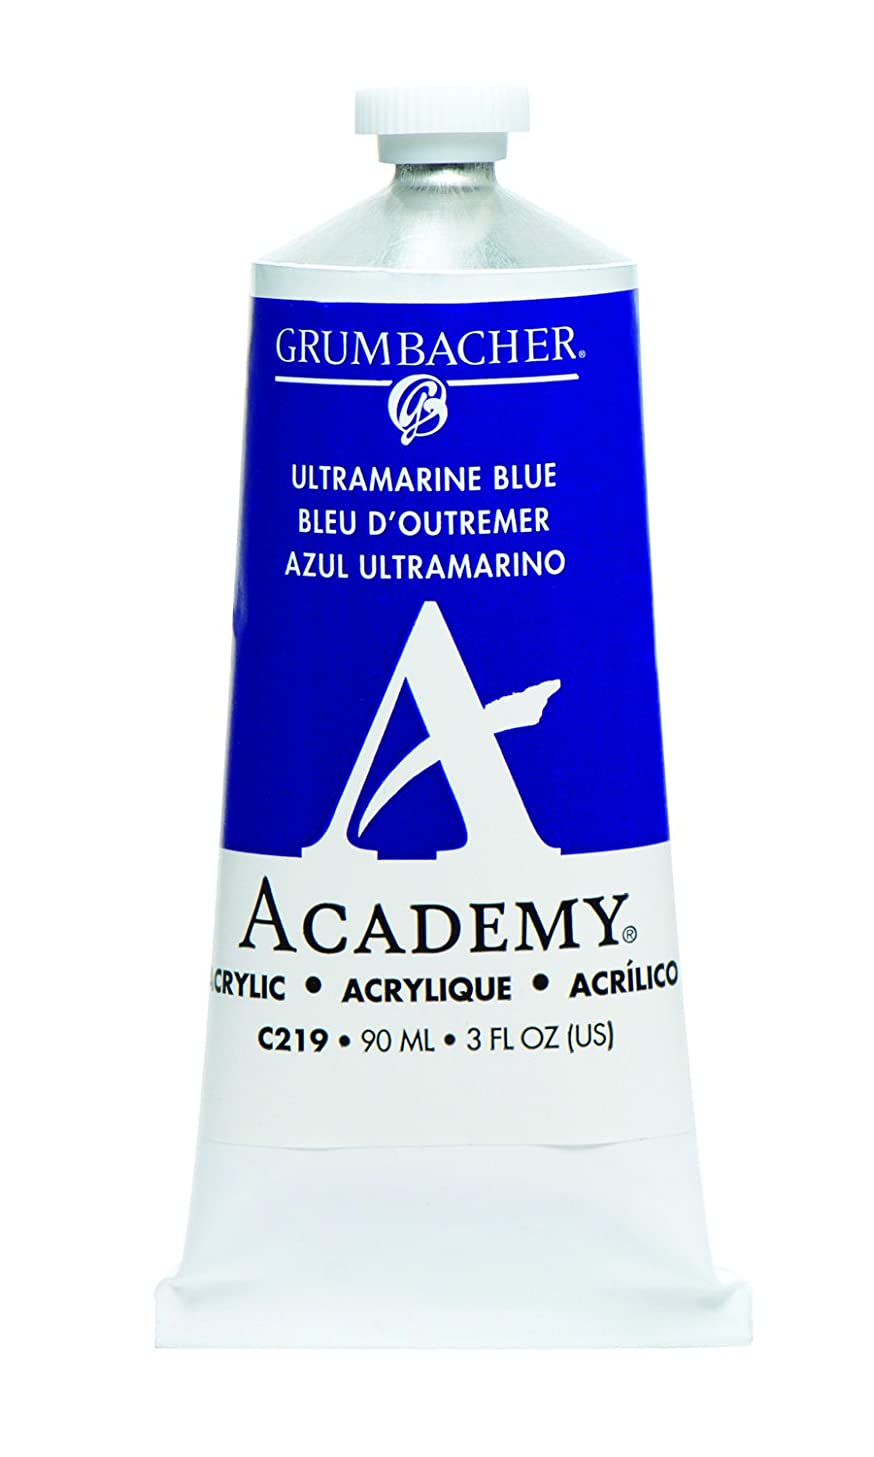 Grumbacher Academy Acrylic Paint, 90ml/3 oz Metal Tube, Ultramarine Blue